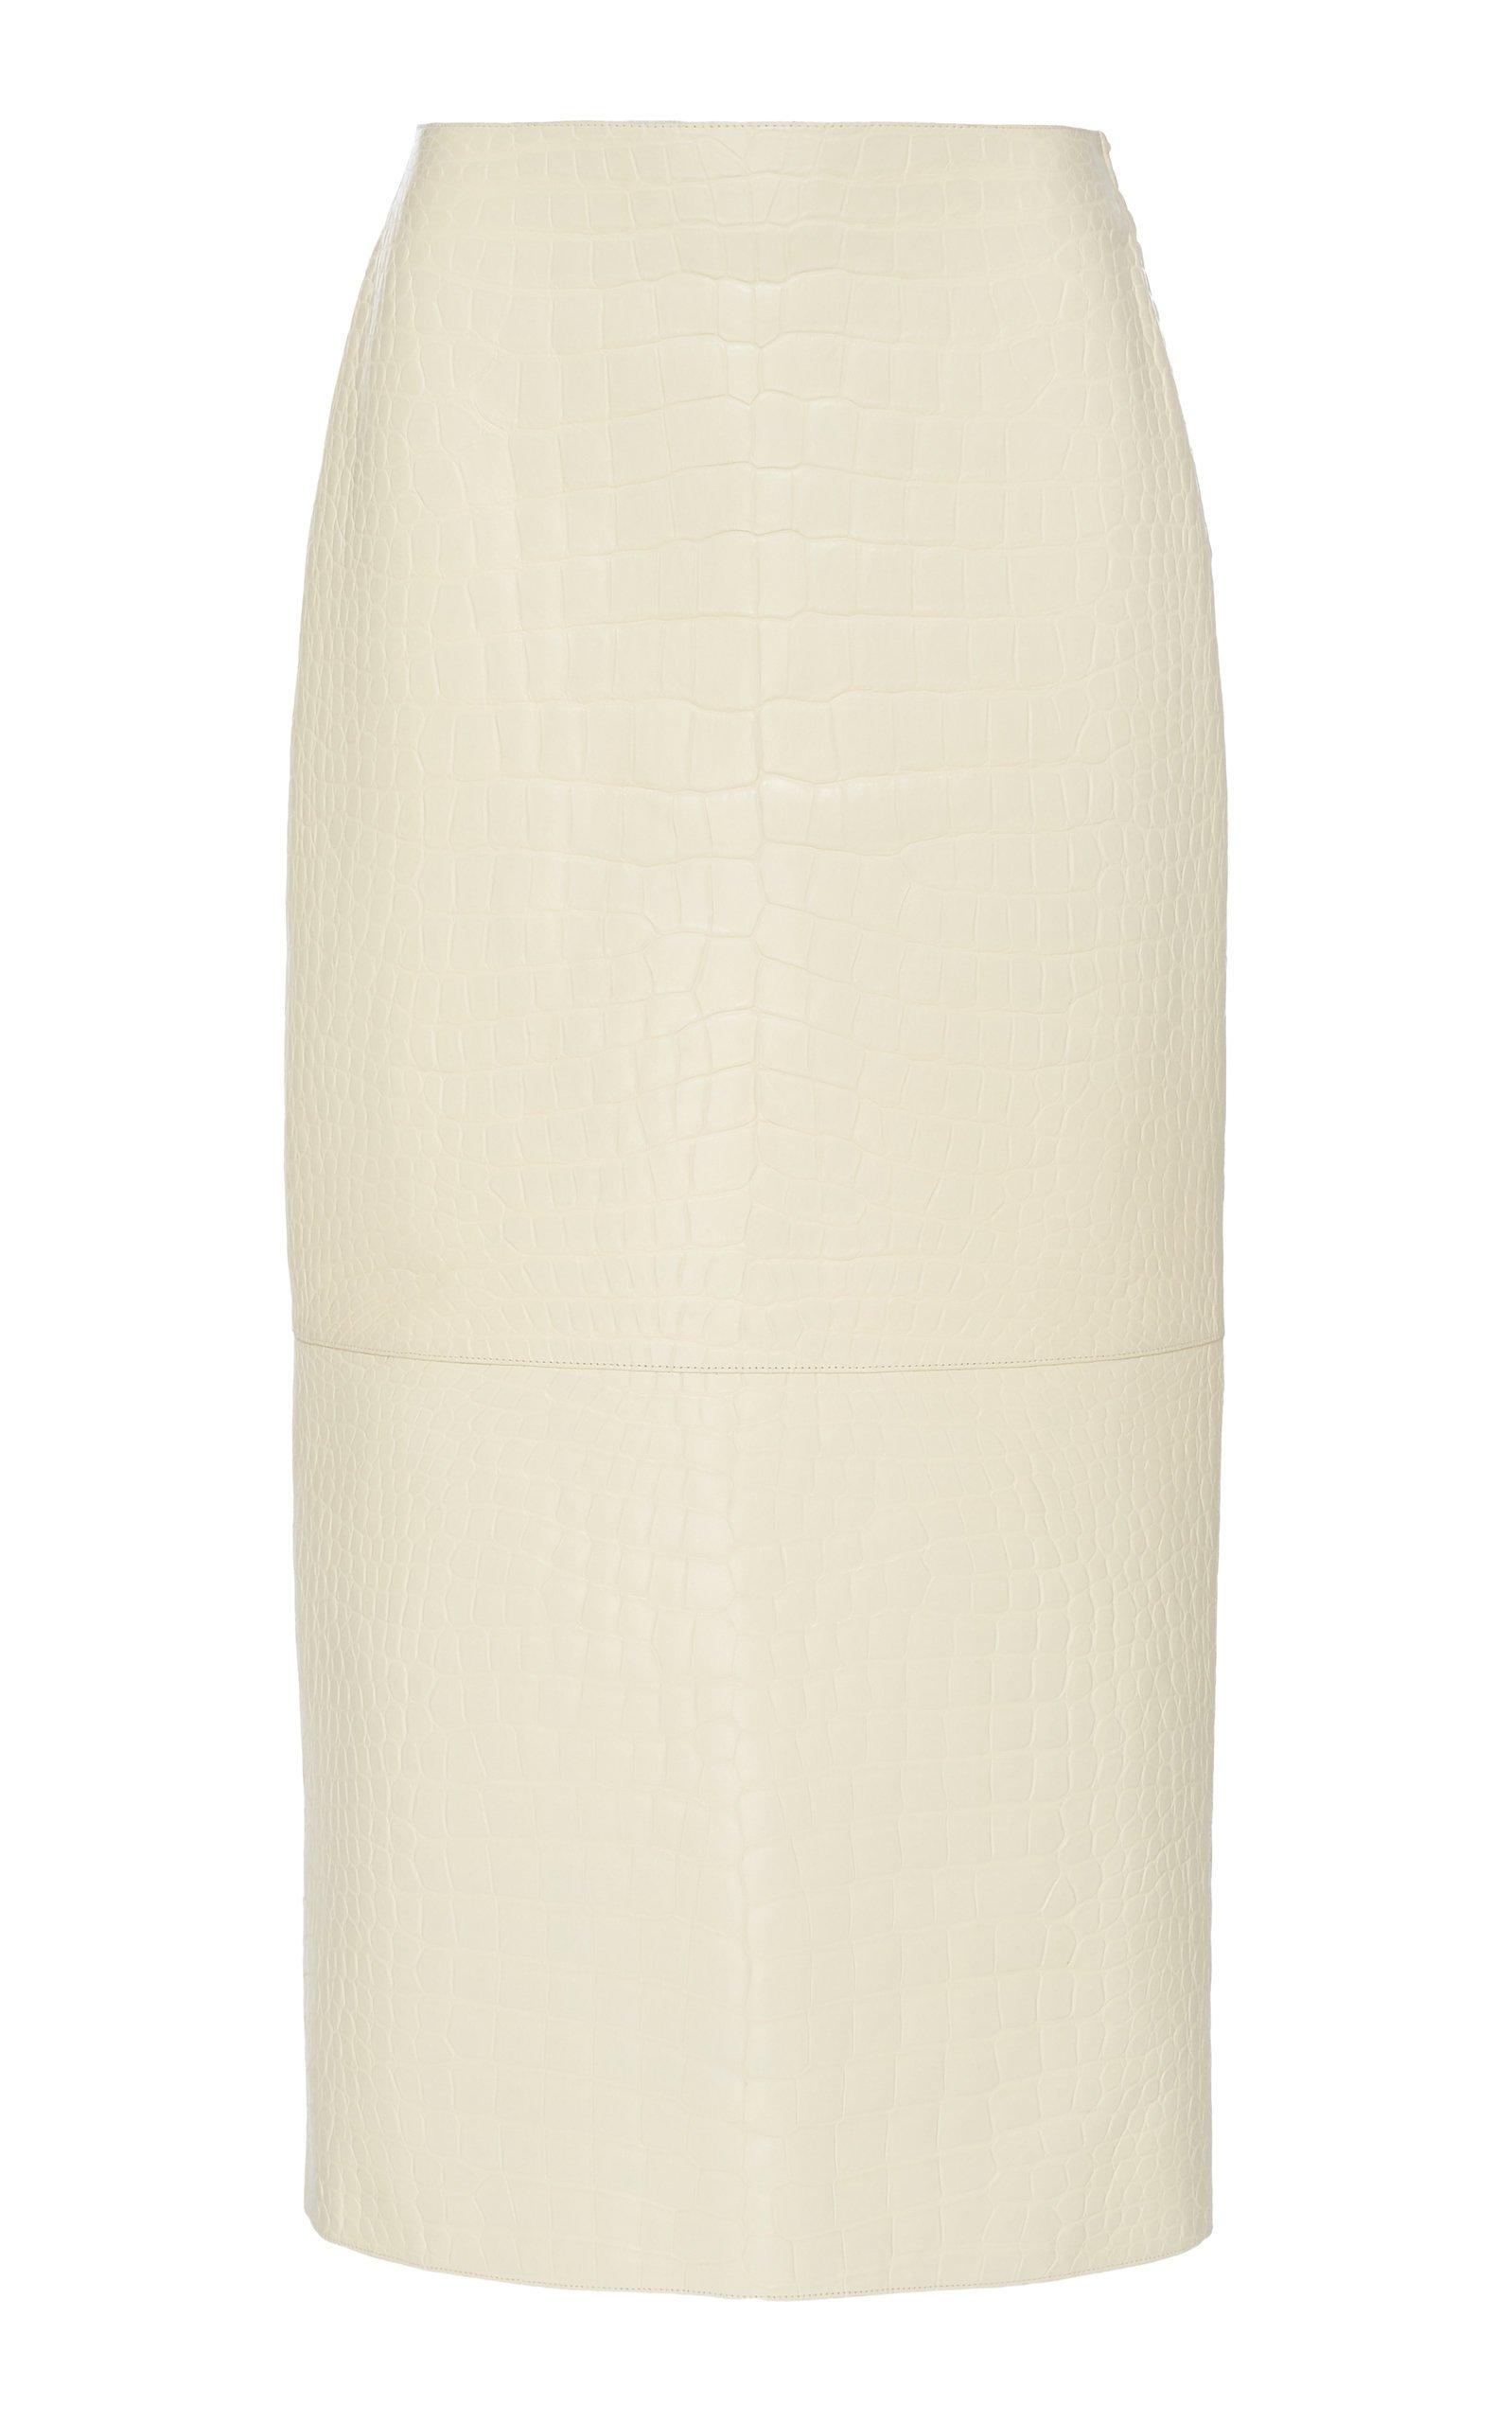 The Row Jenna Crocodile Midi Skirt Size: 6